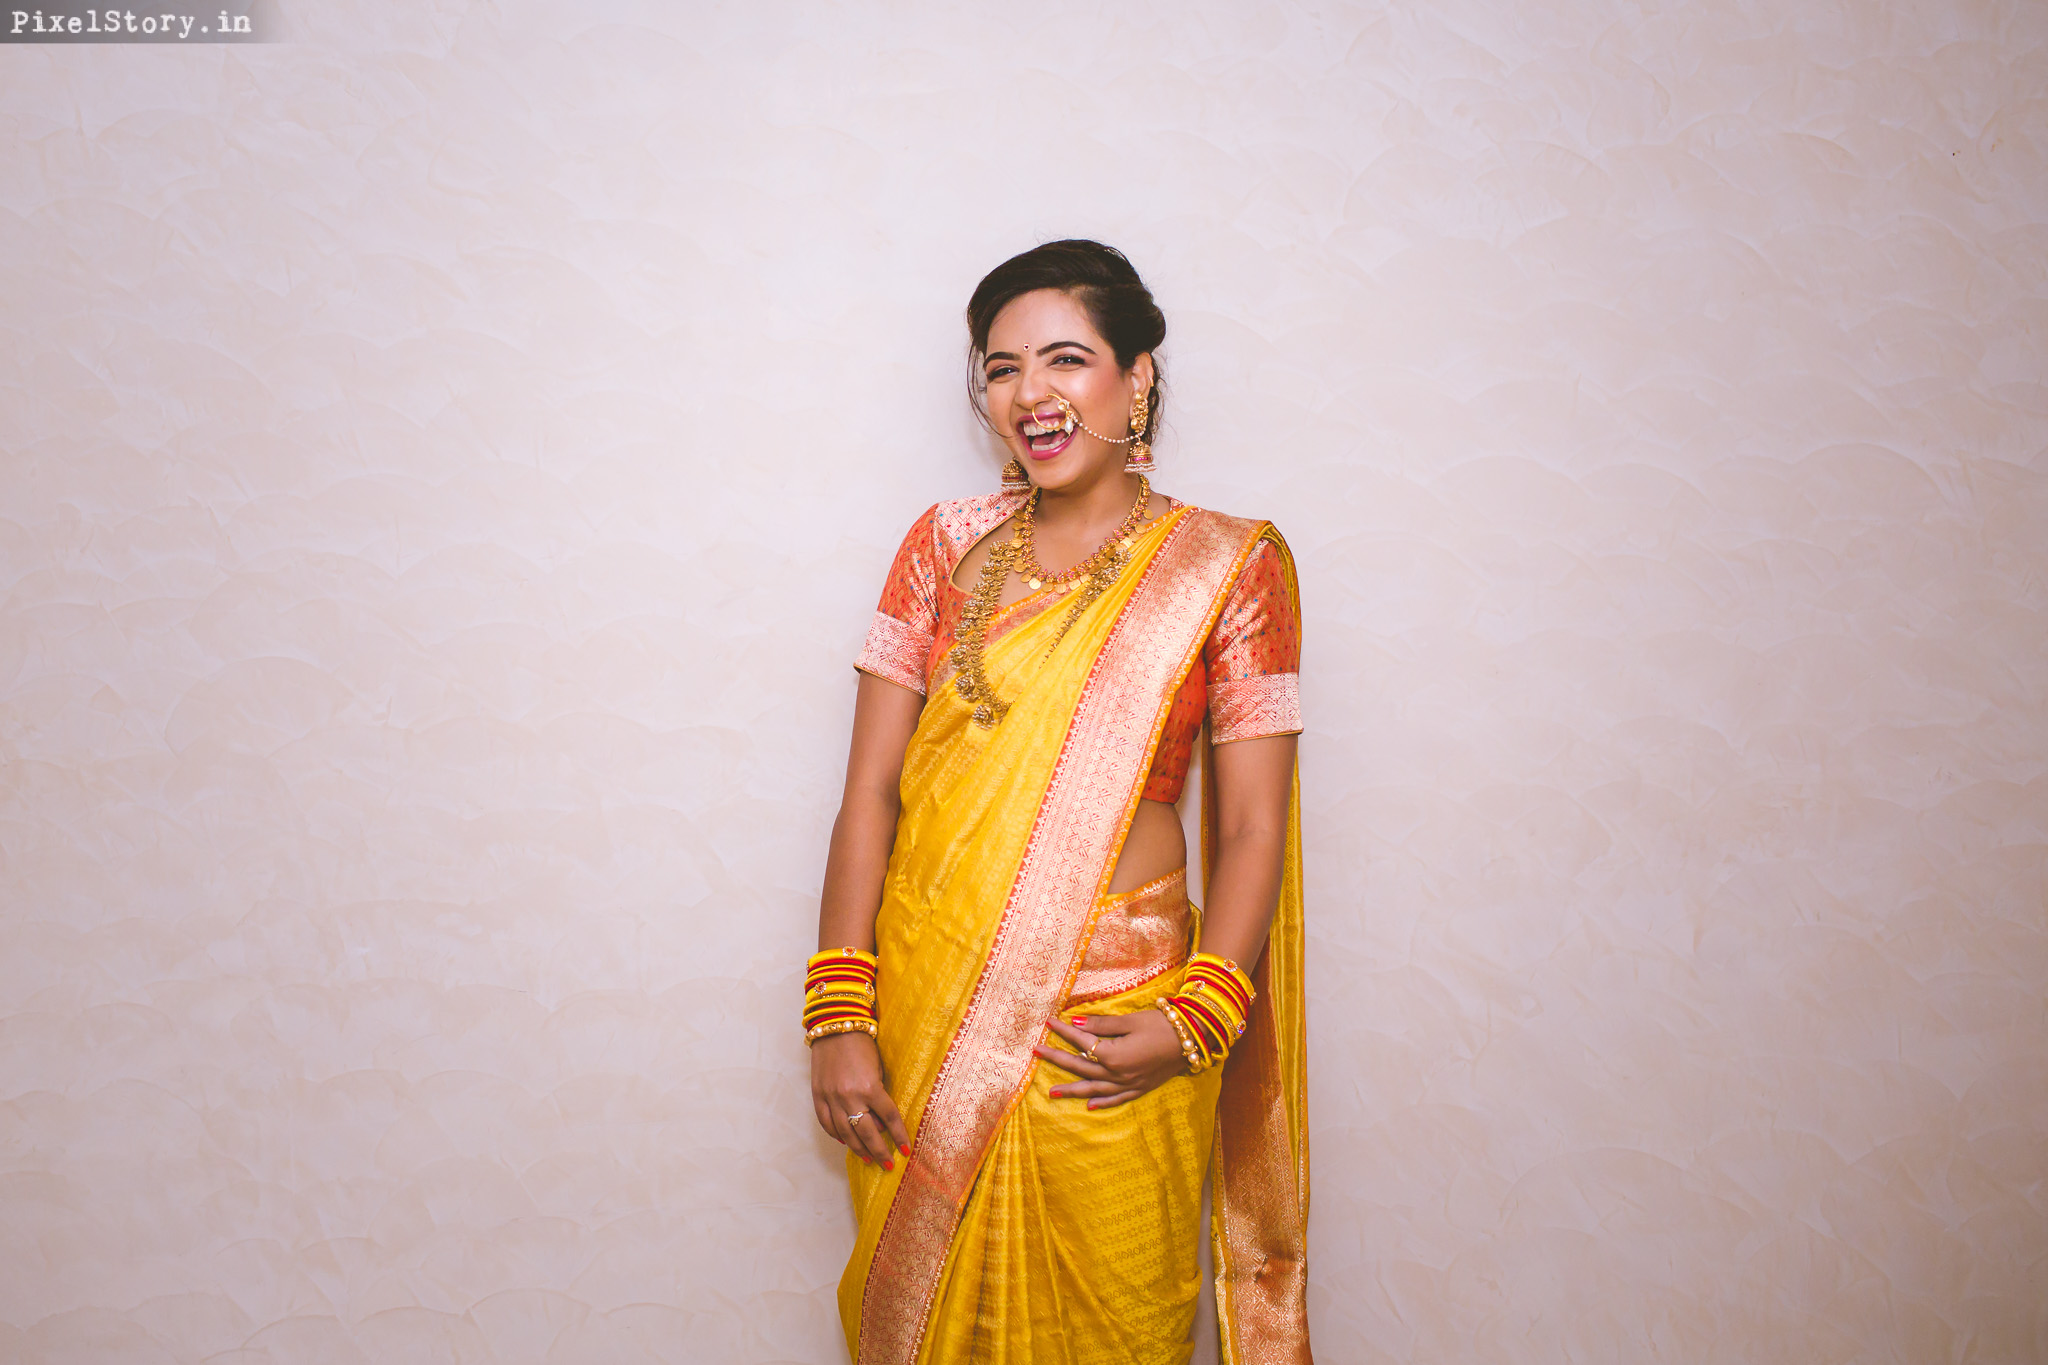 PixelStory-Engagement-Ritz-Carlton-Preksha-Bharath-002.jpg